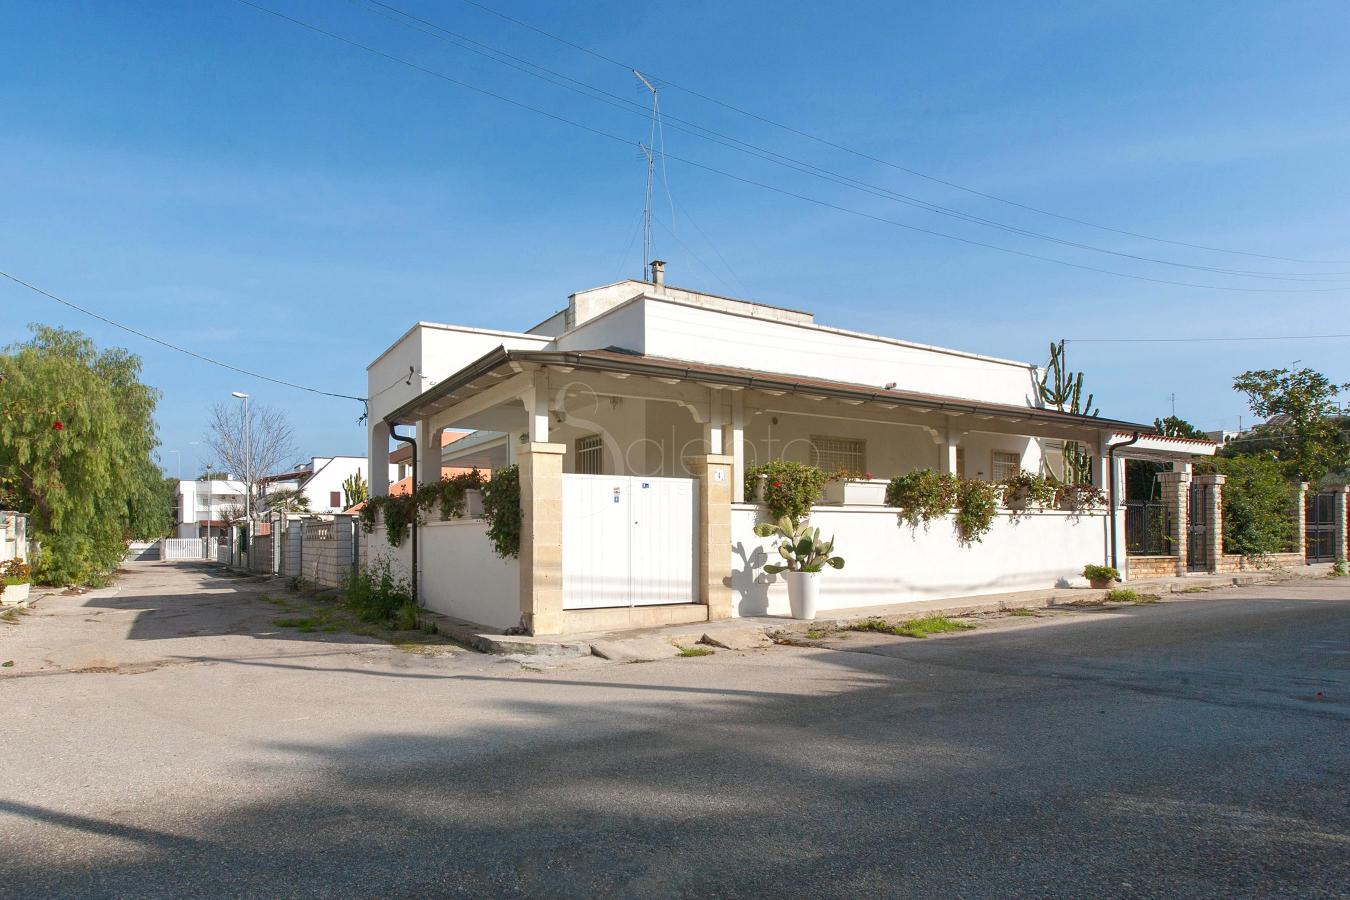 holiday homes - Carovigno ( Brindisi ) - Maison Rivière